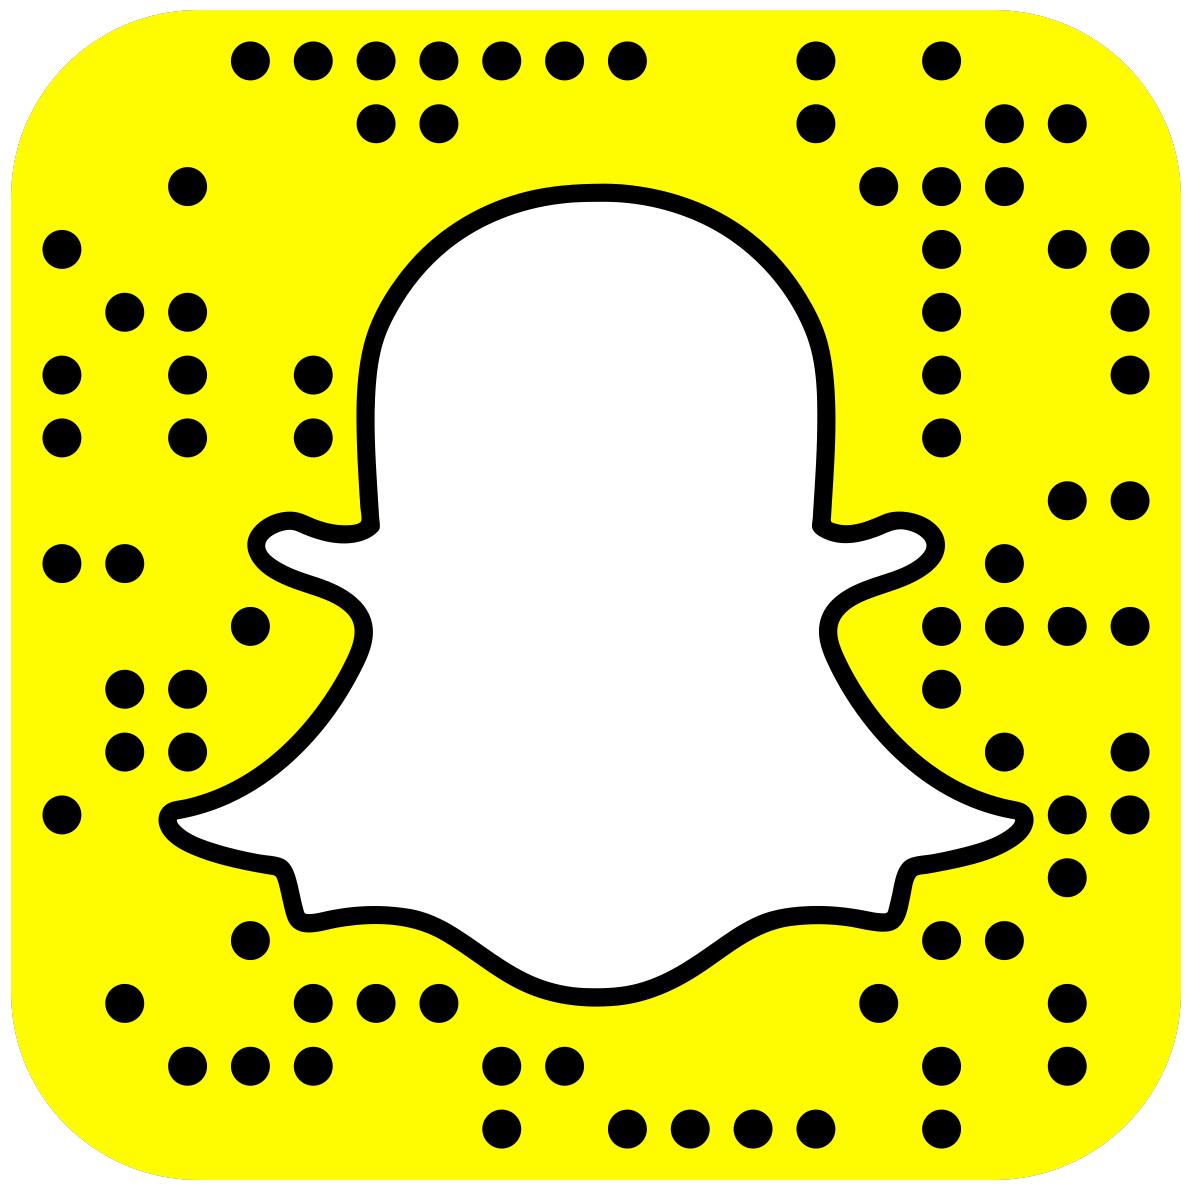 Shilique Calhoun Snapchat username